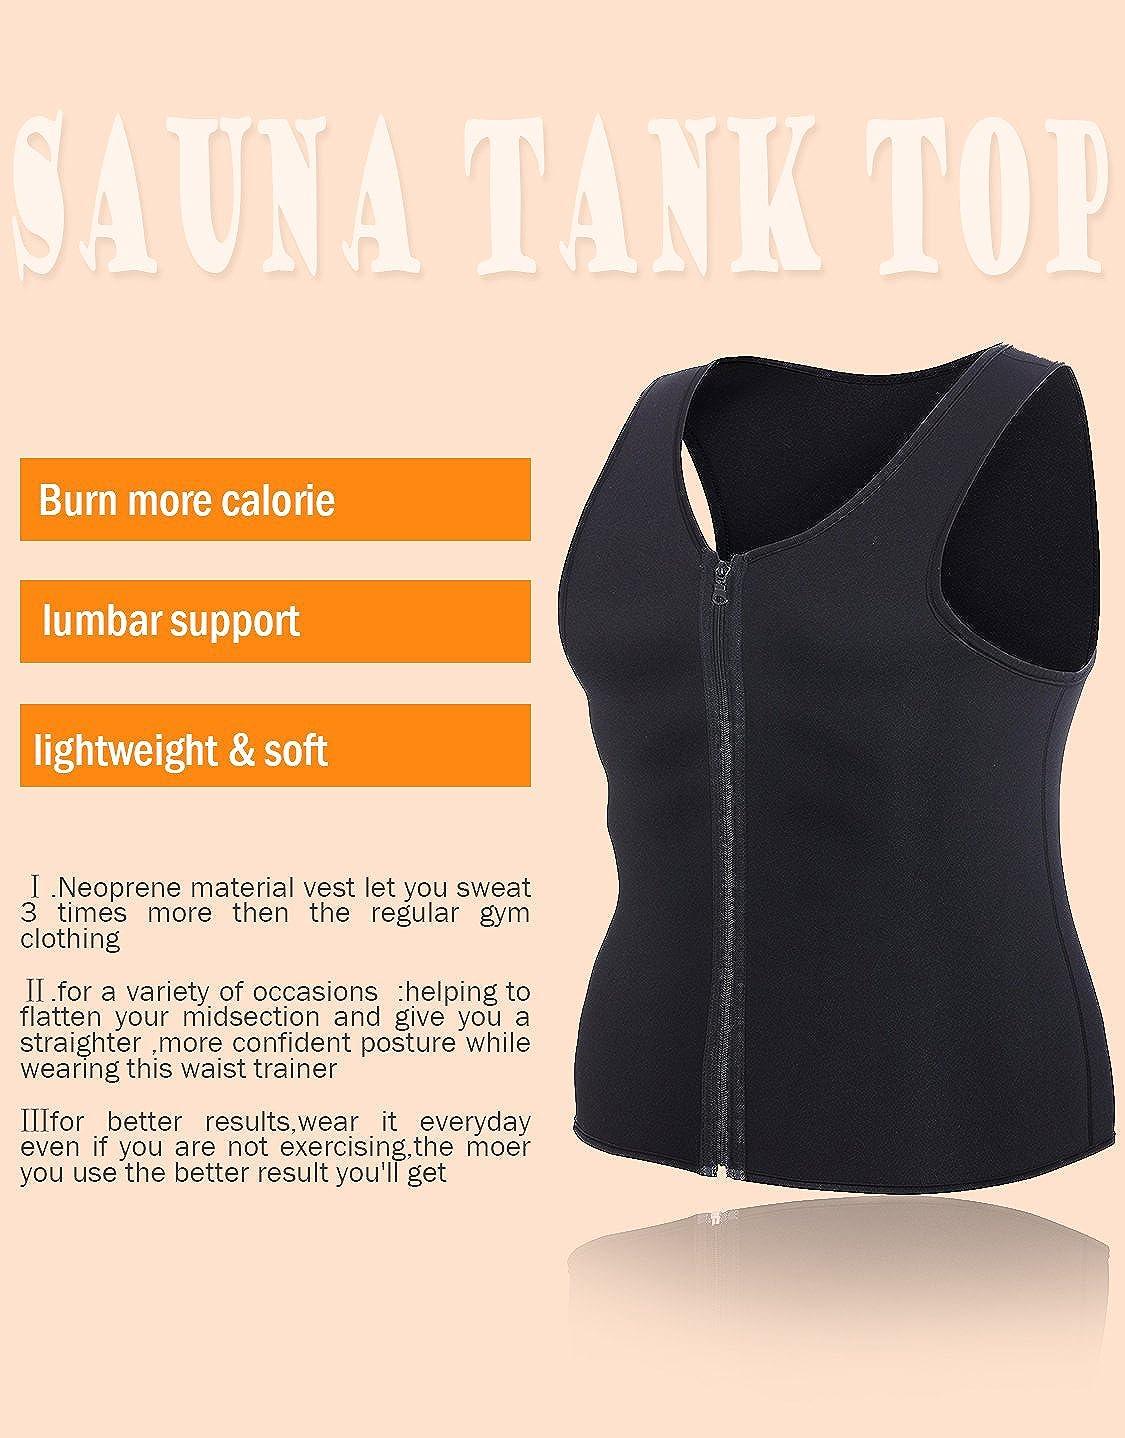 84d216cdf2 Amazon.com  Exerthy Men Sauna Waist Trainer Vest for Weightloss Neoprene  Compression Tank Top Body Shaper Slimming Shirt Corset  Clothing